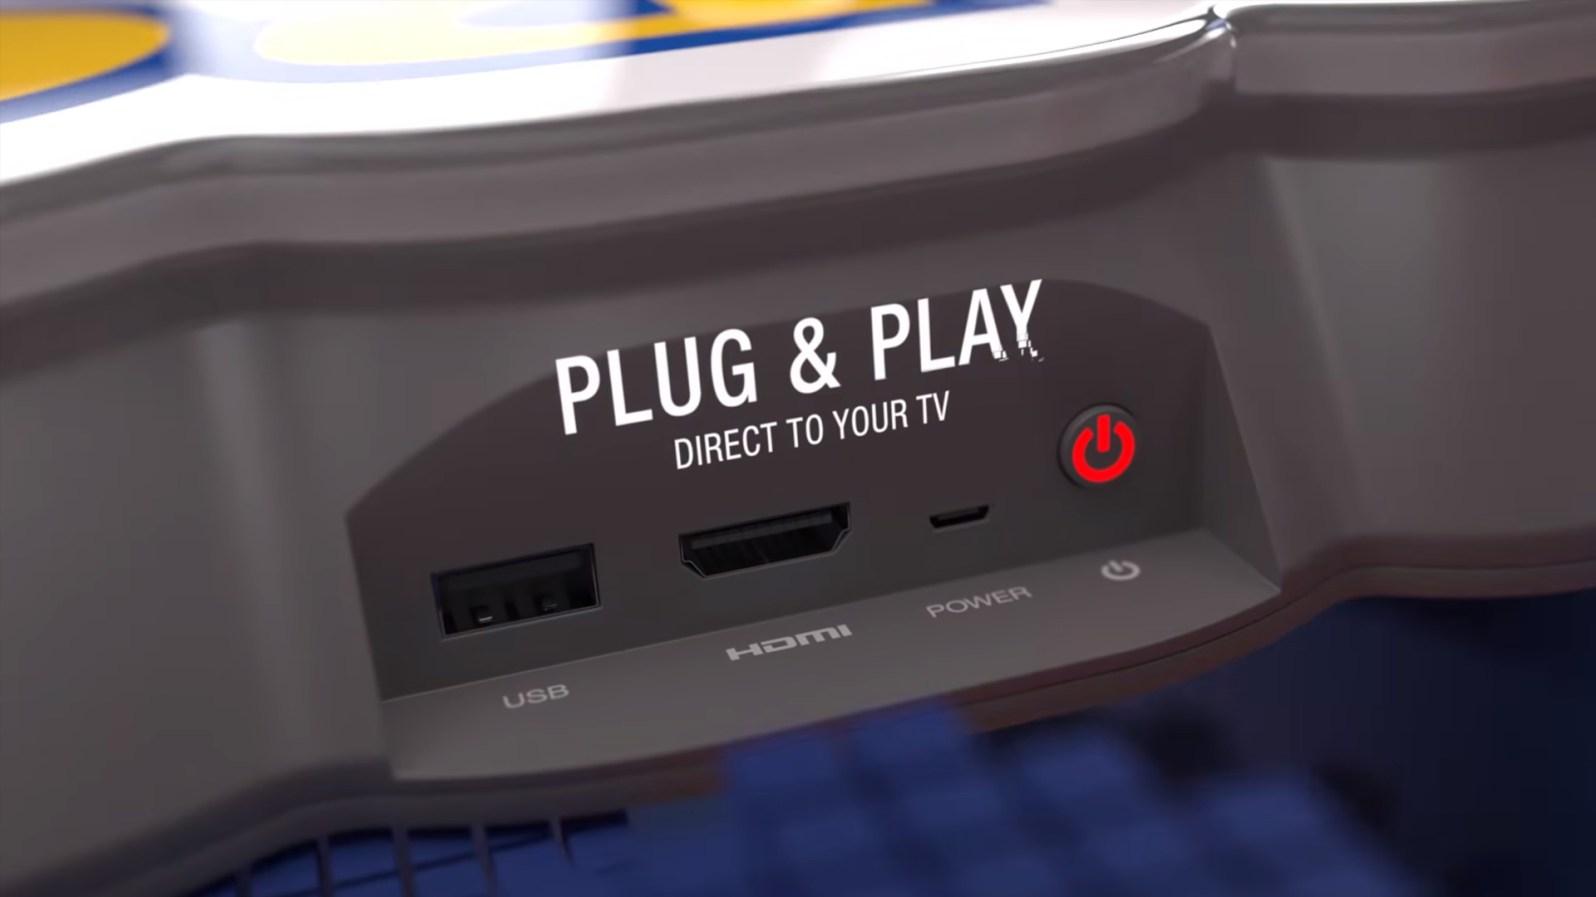 Quelle: Youtube - Capcom Home Arcade - Anschlüsse